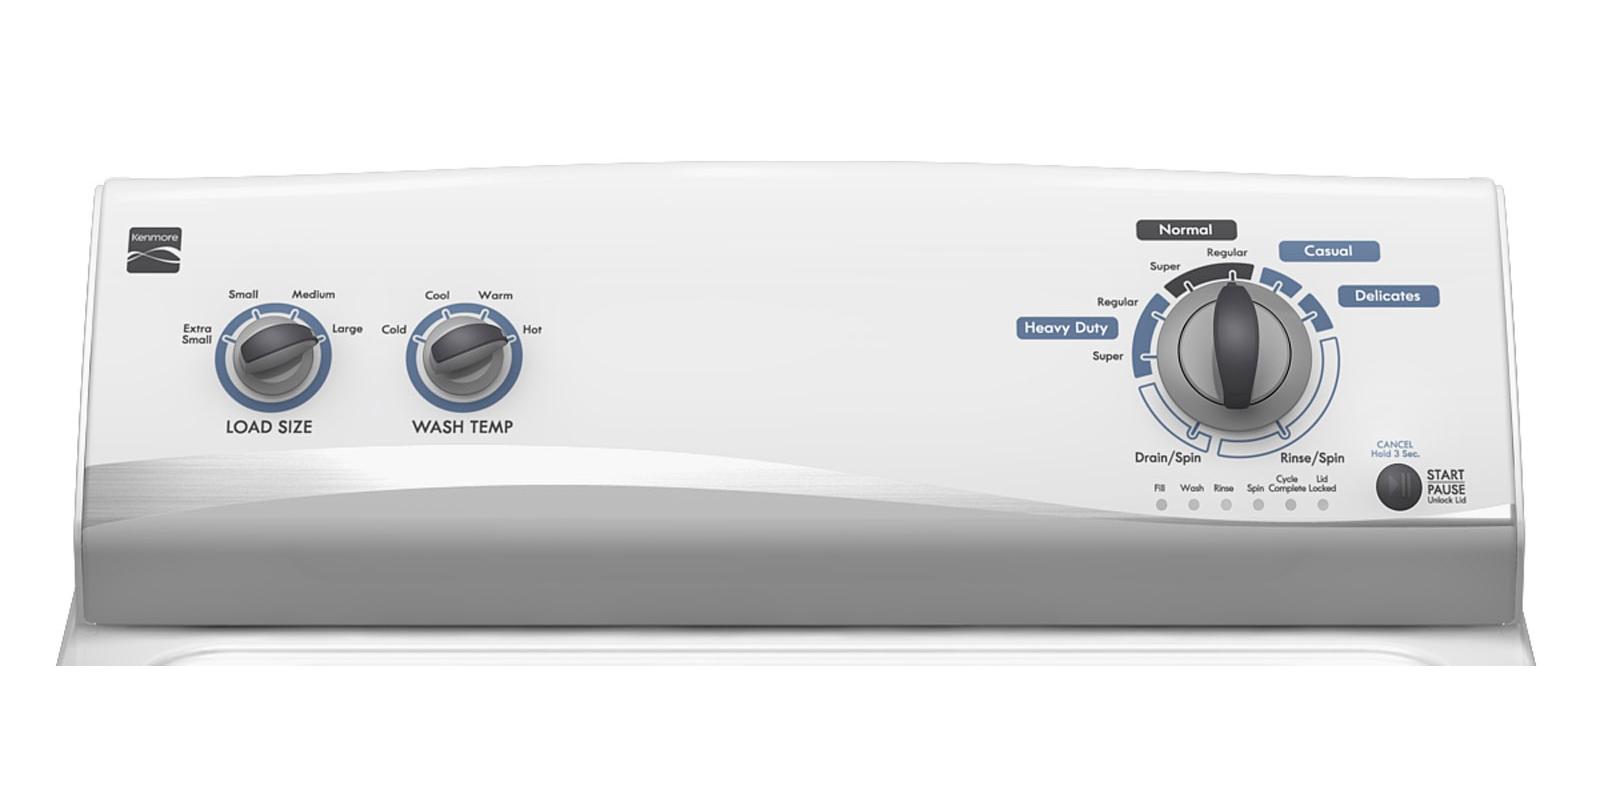 Kenmore 3.4 cu. ft. Top-Load Washing Machine - White